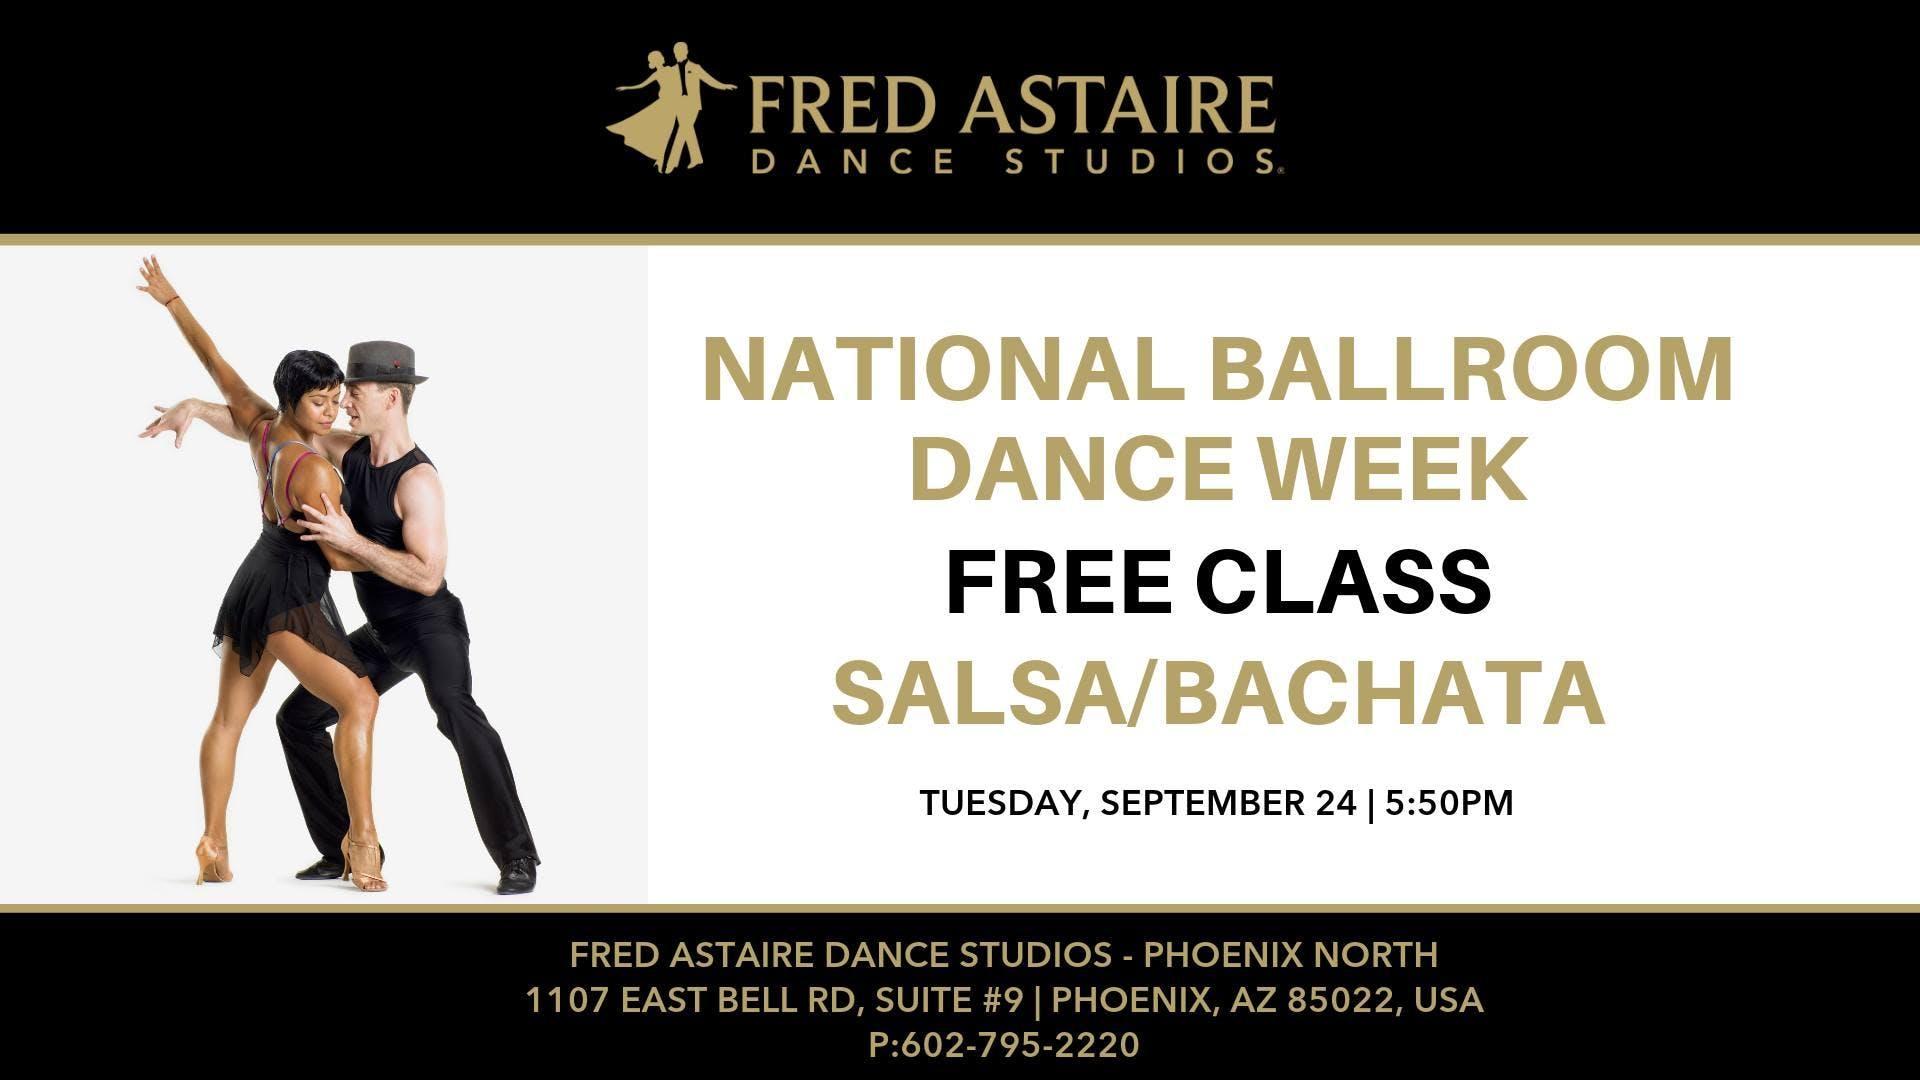 Free Beginners Salsa/Bachata Class